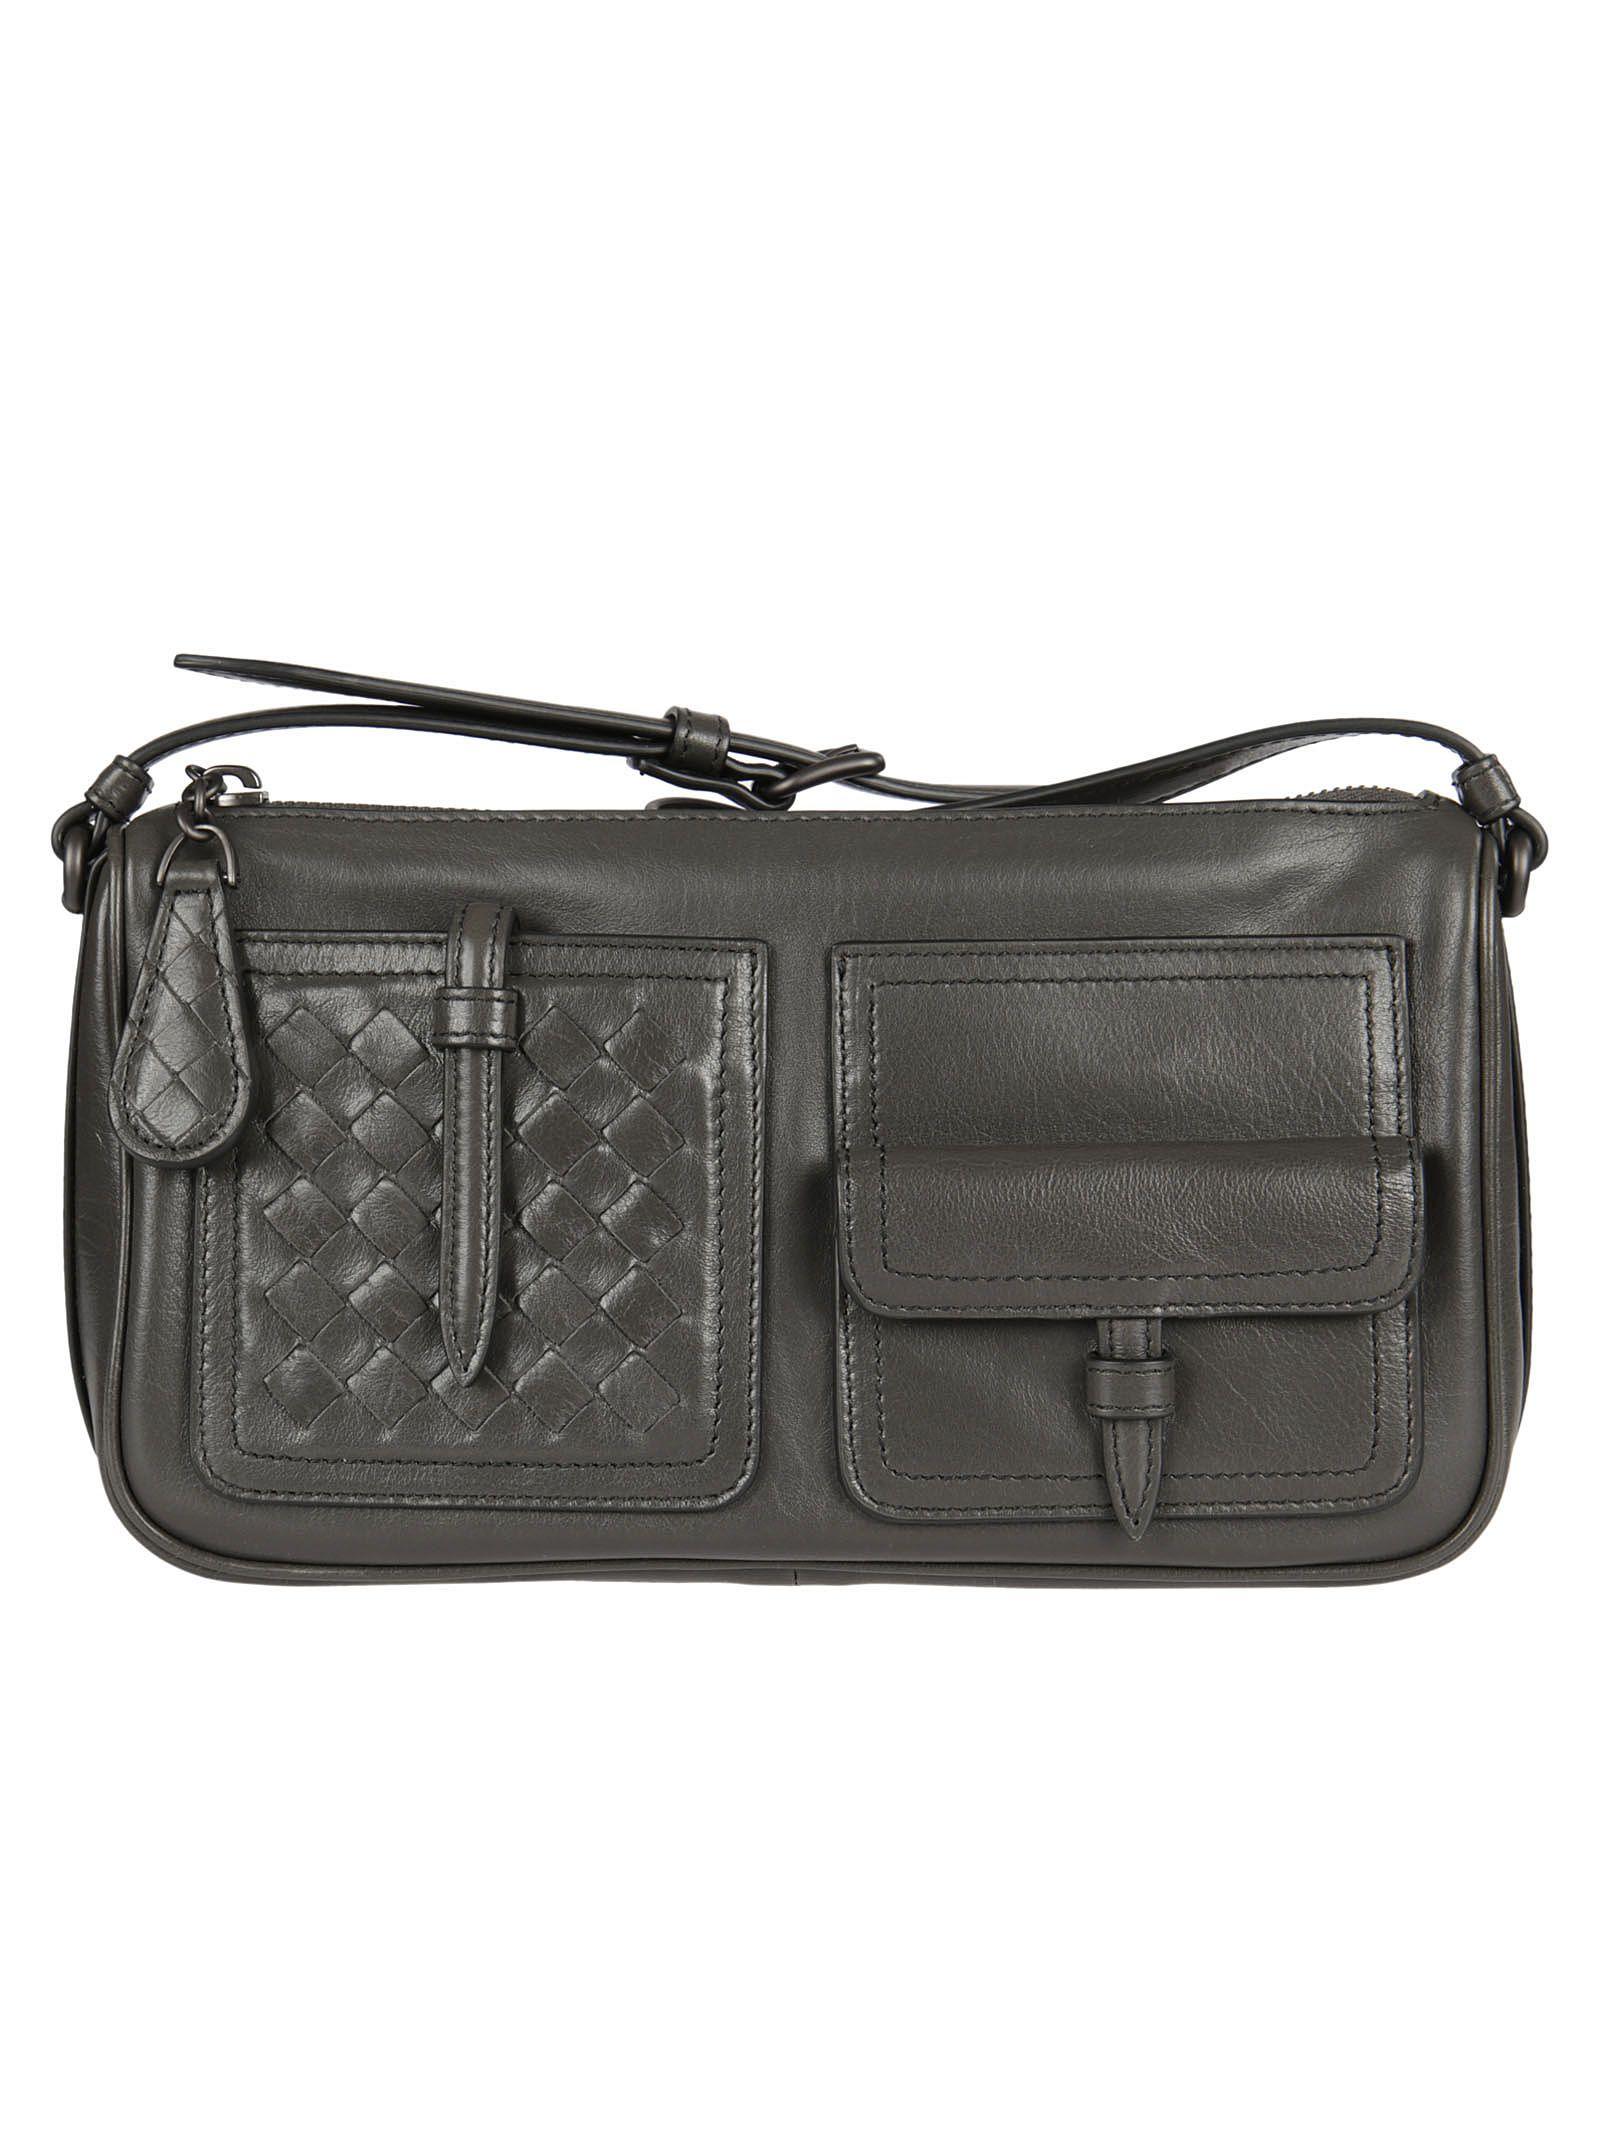 Bottega Veneta Simple Pocket Shoulder Bag